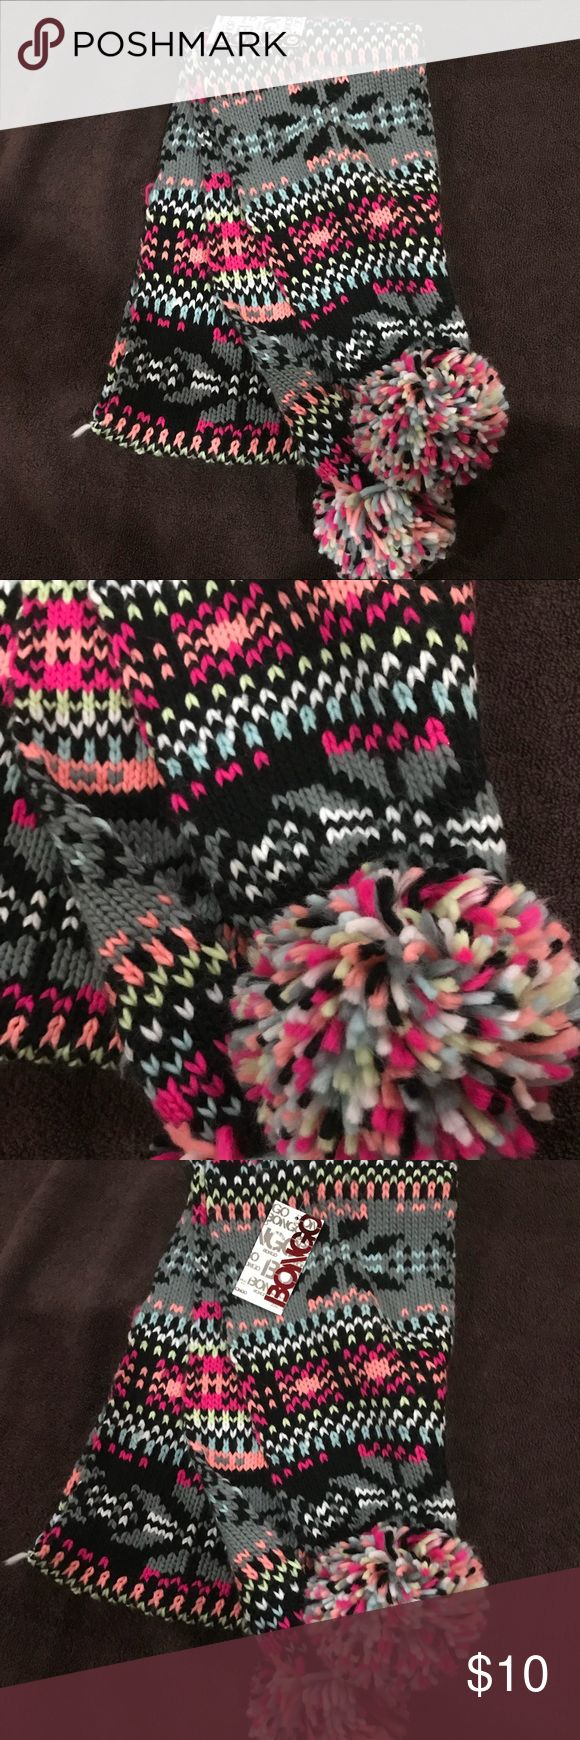 Bongo Multi-Color Scarf NWT BONGO Accessories Scarves & Wraps